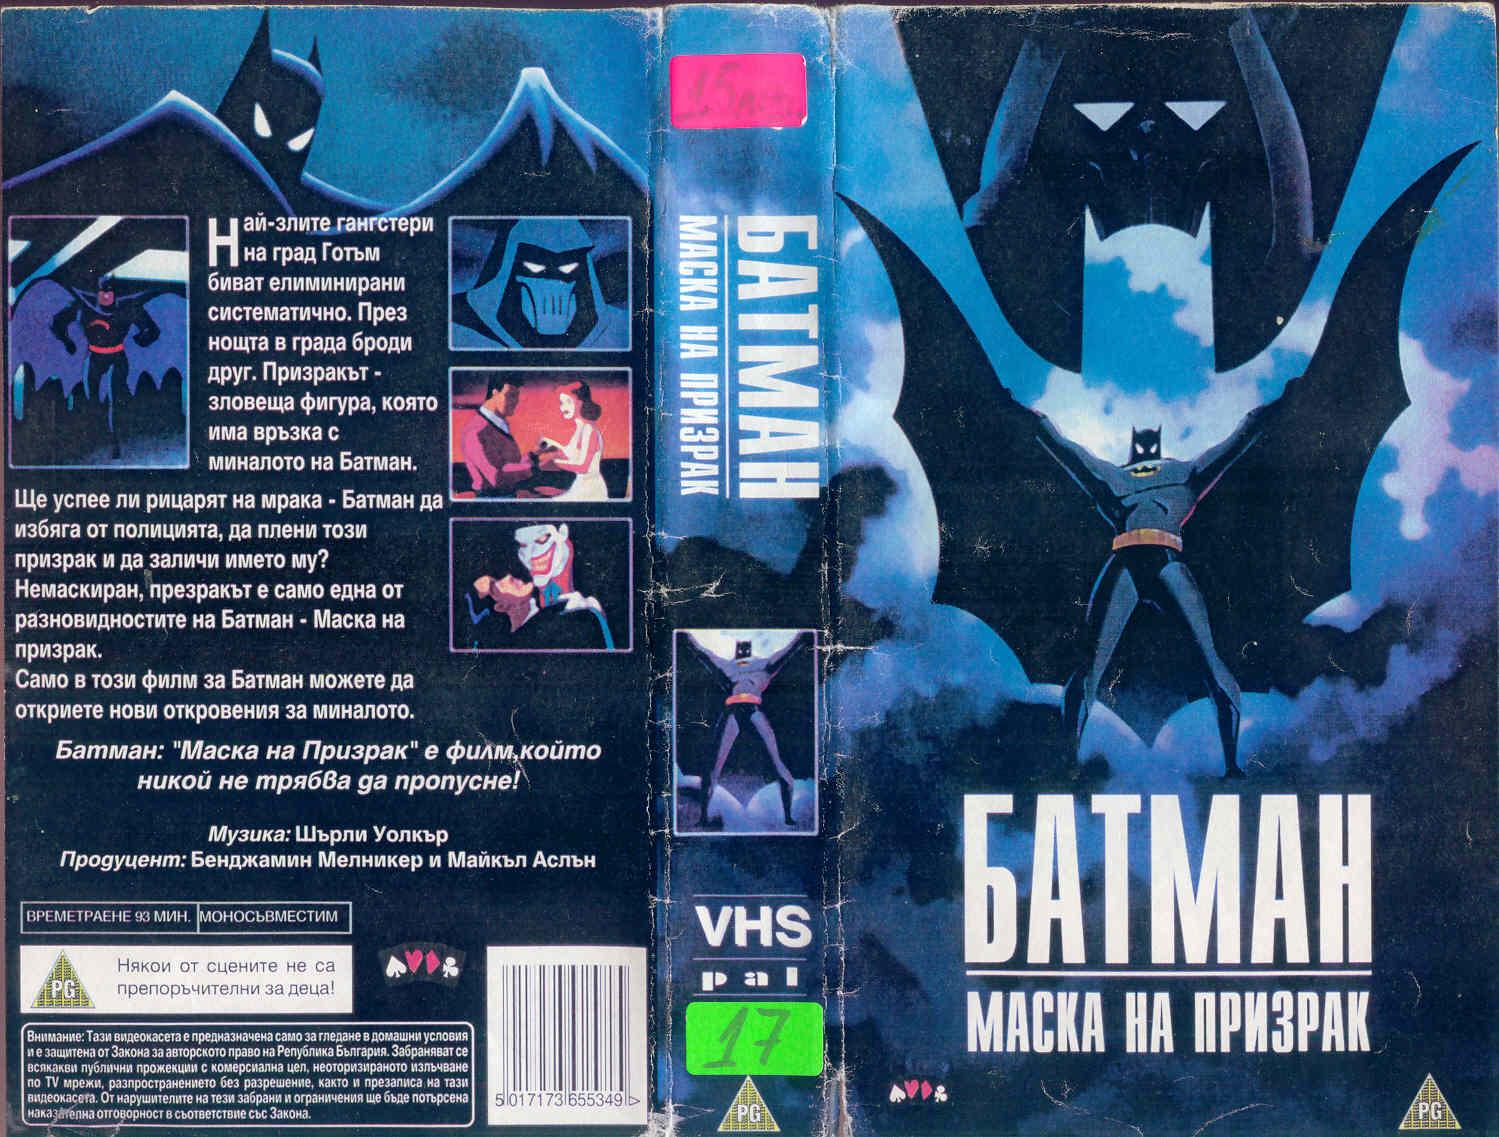 Батман Маска на призрак анимация